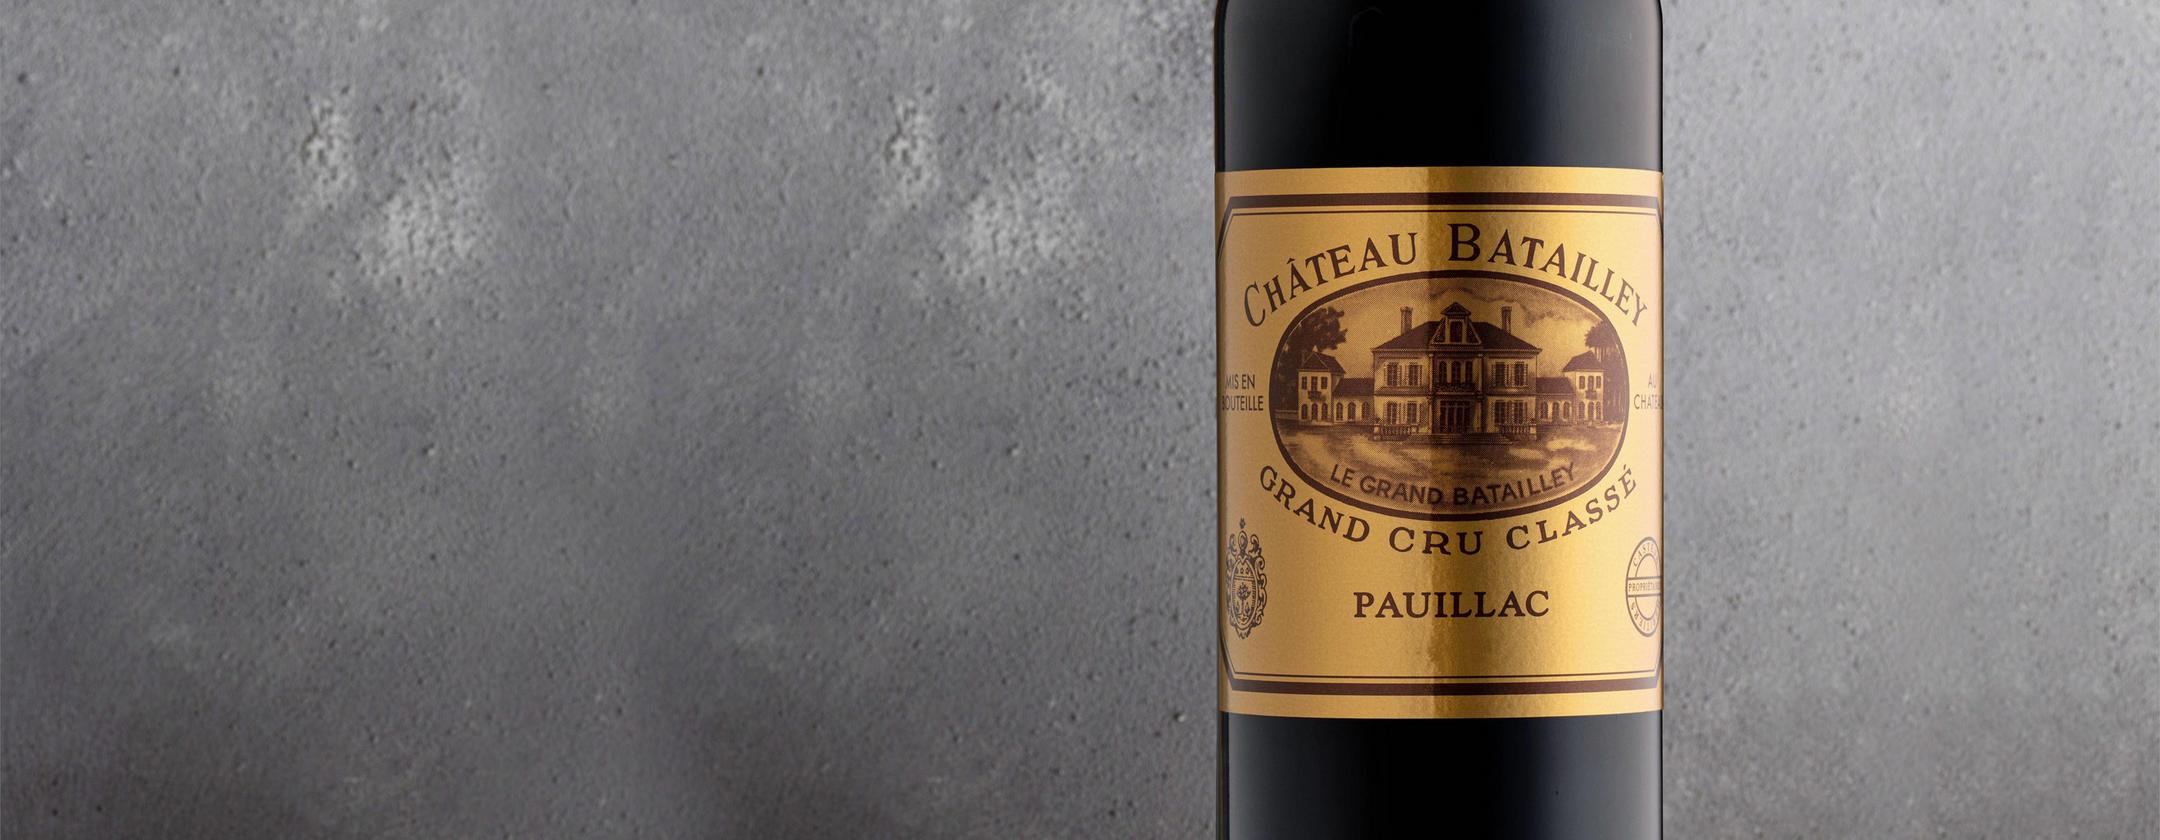 2016 Château Batailley, Pauillac _ A true customer favourite